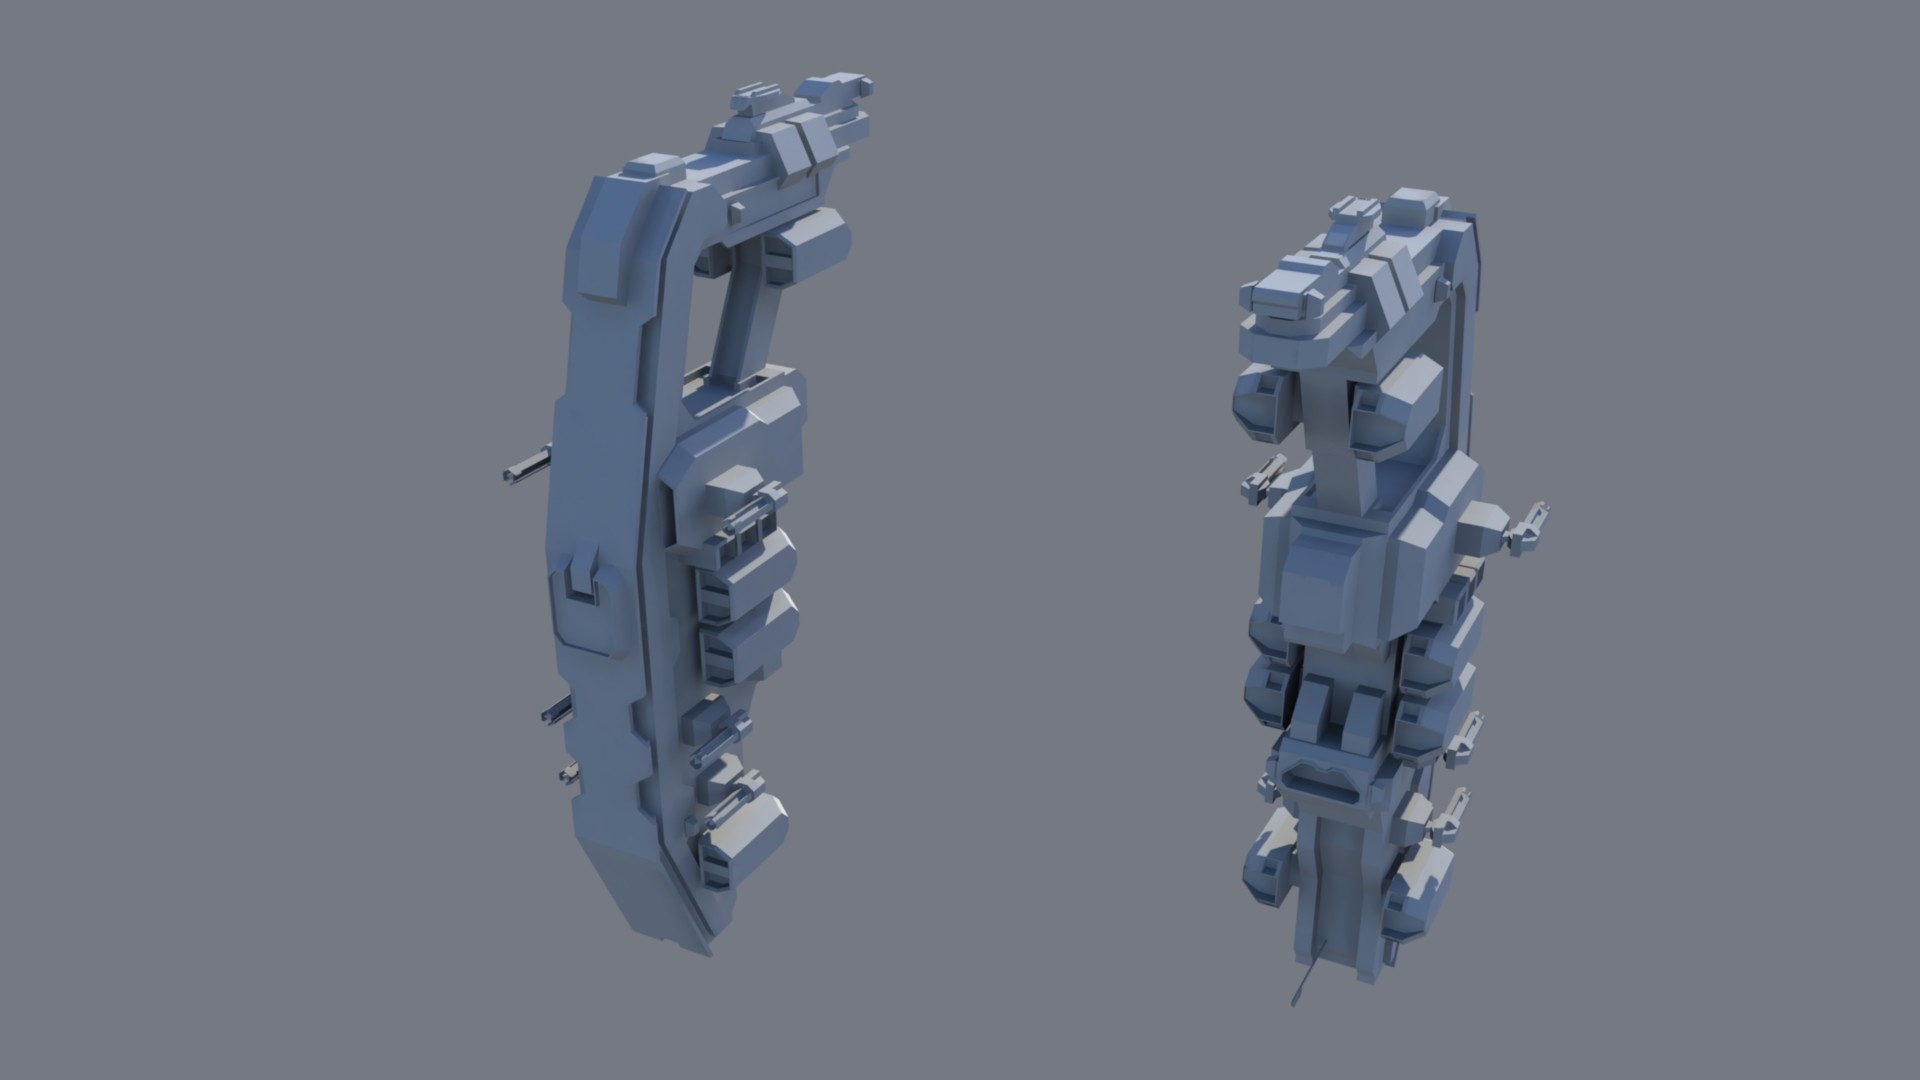 Optimized model. Sitting around 2.5k poly.